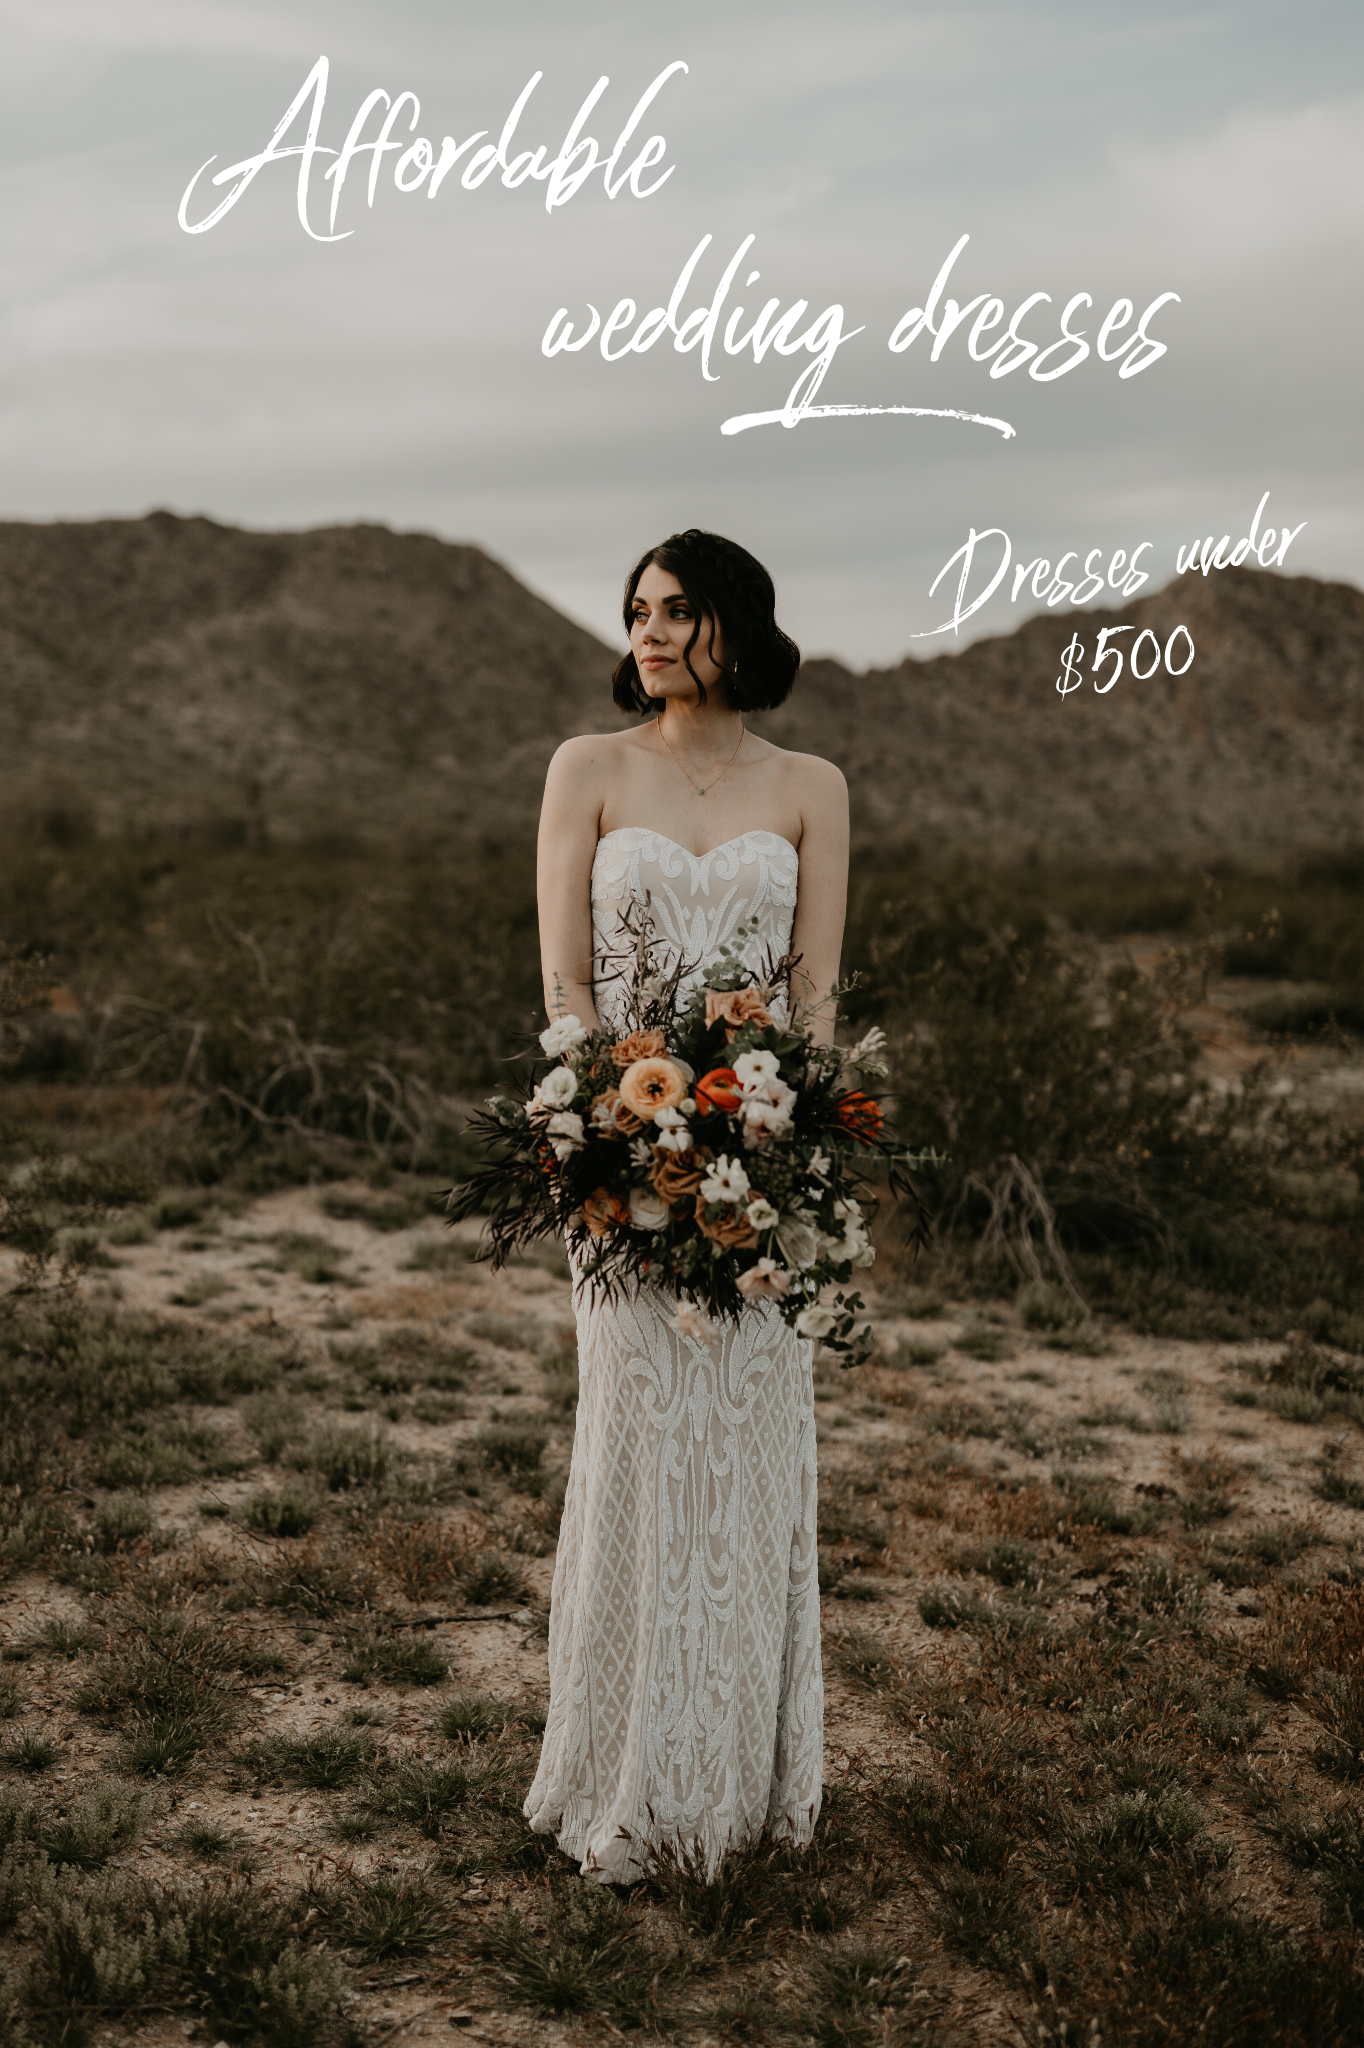 Affordable Wedding Dresses Wedding Dresses Under 500 Phoenix Arizona Wedding Photographer Kali M Photos